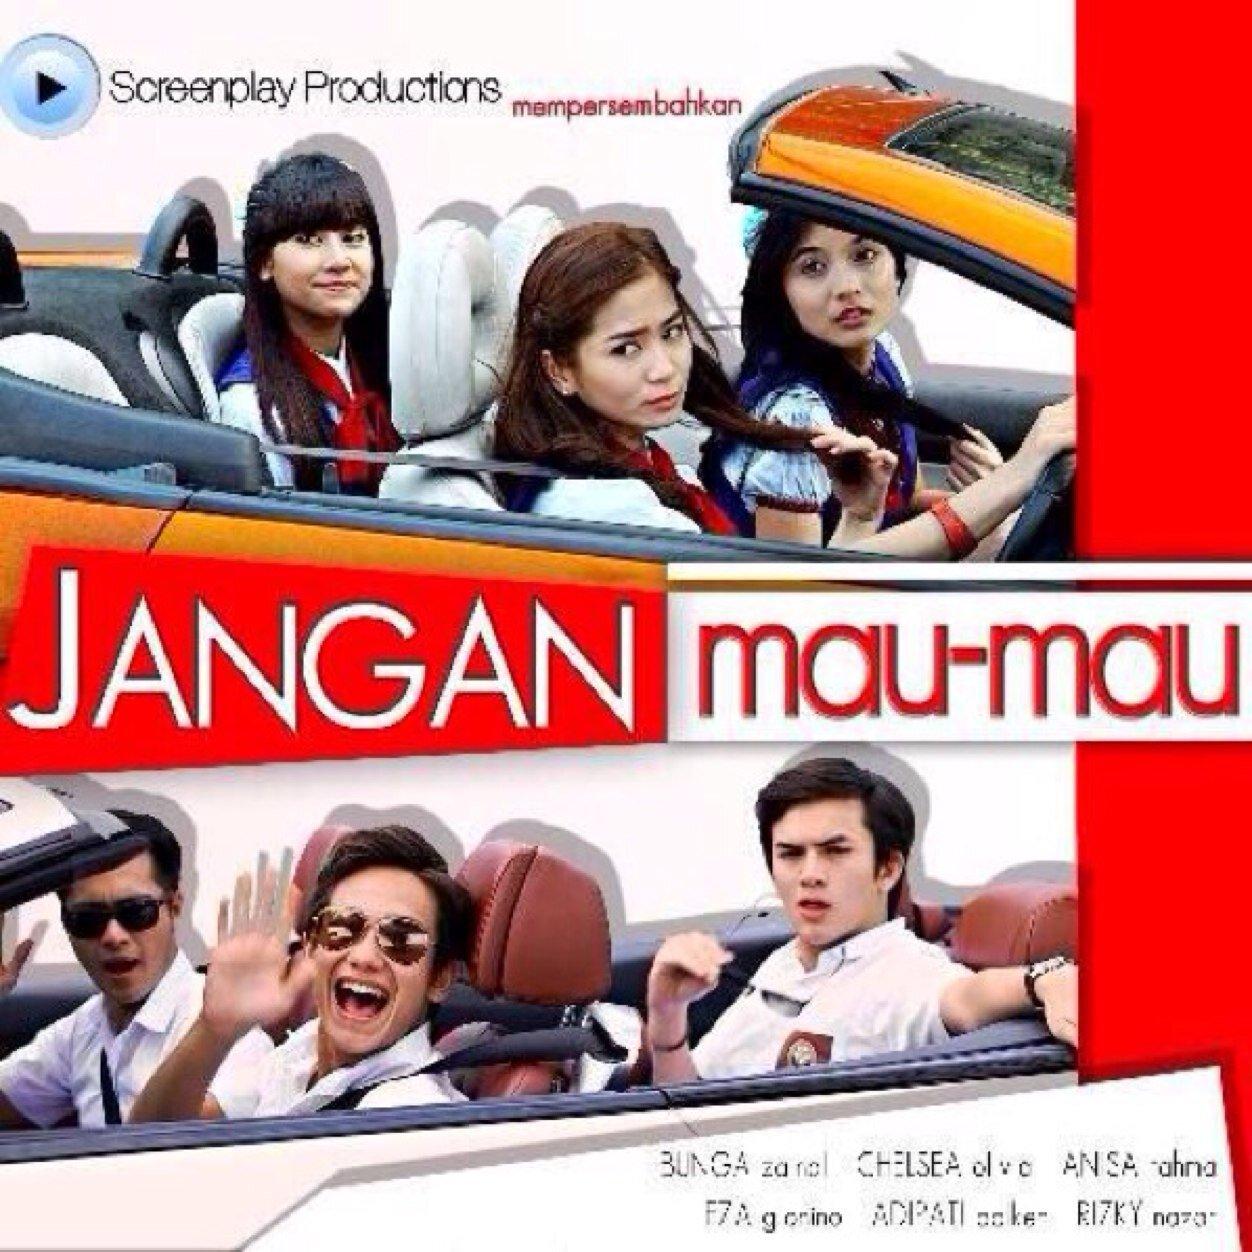 "Sctv: JANGAN MAU MAU SCTV On Twitter: ""Ayo Follow Official"